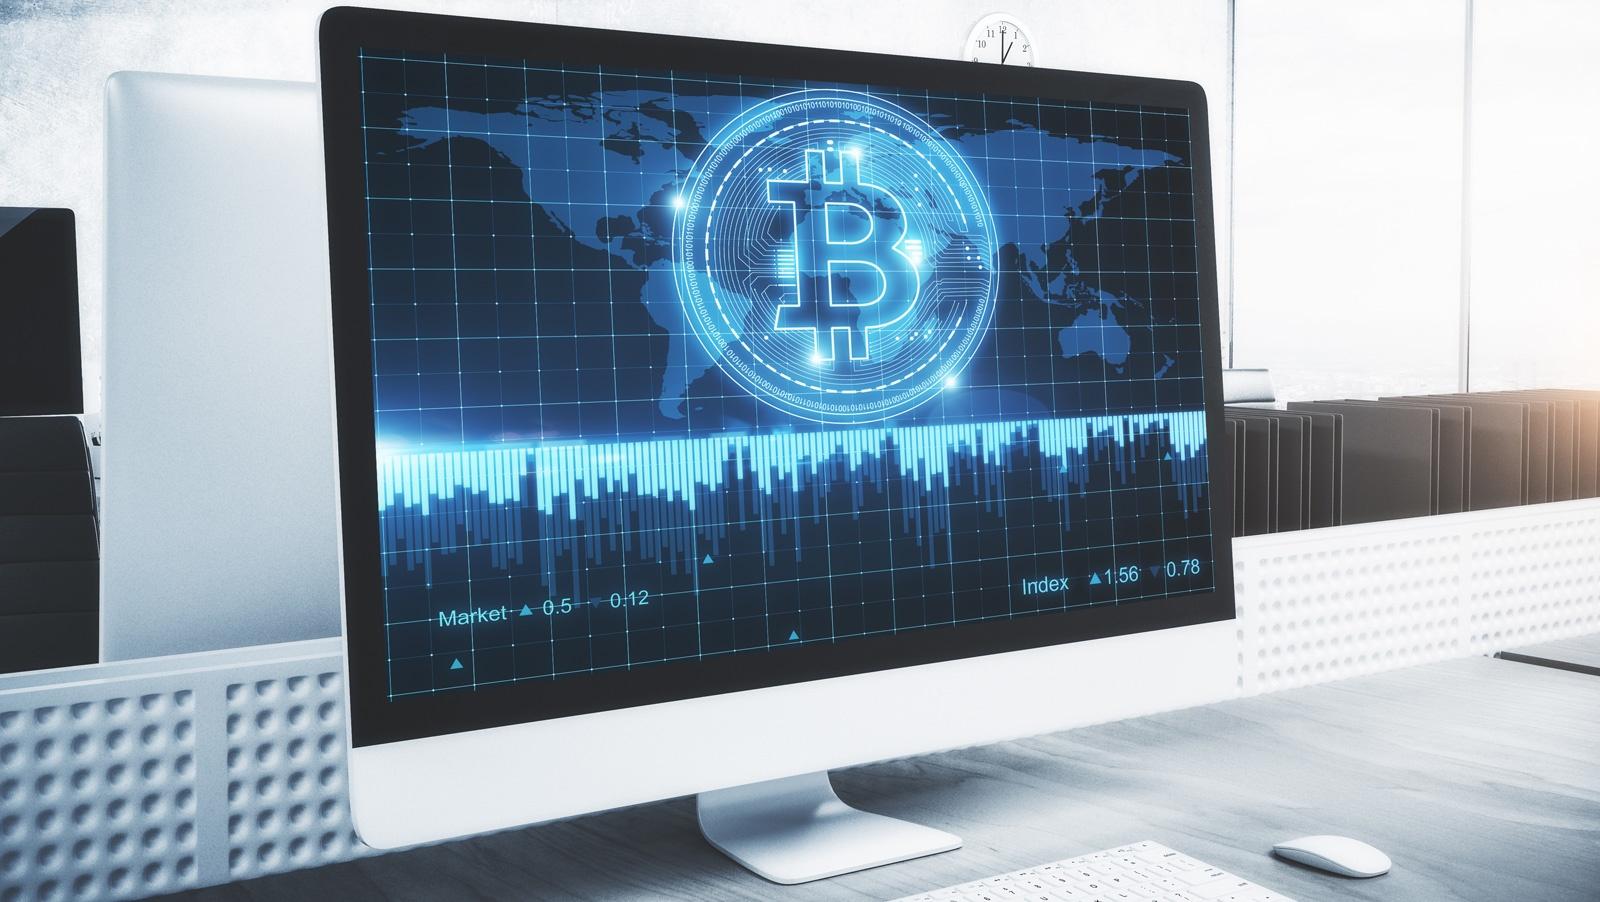 CalvinAyre.com's most read Bitcoin stories of 2017